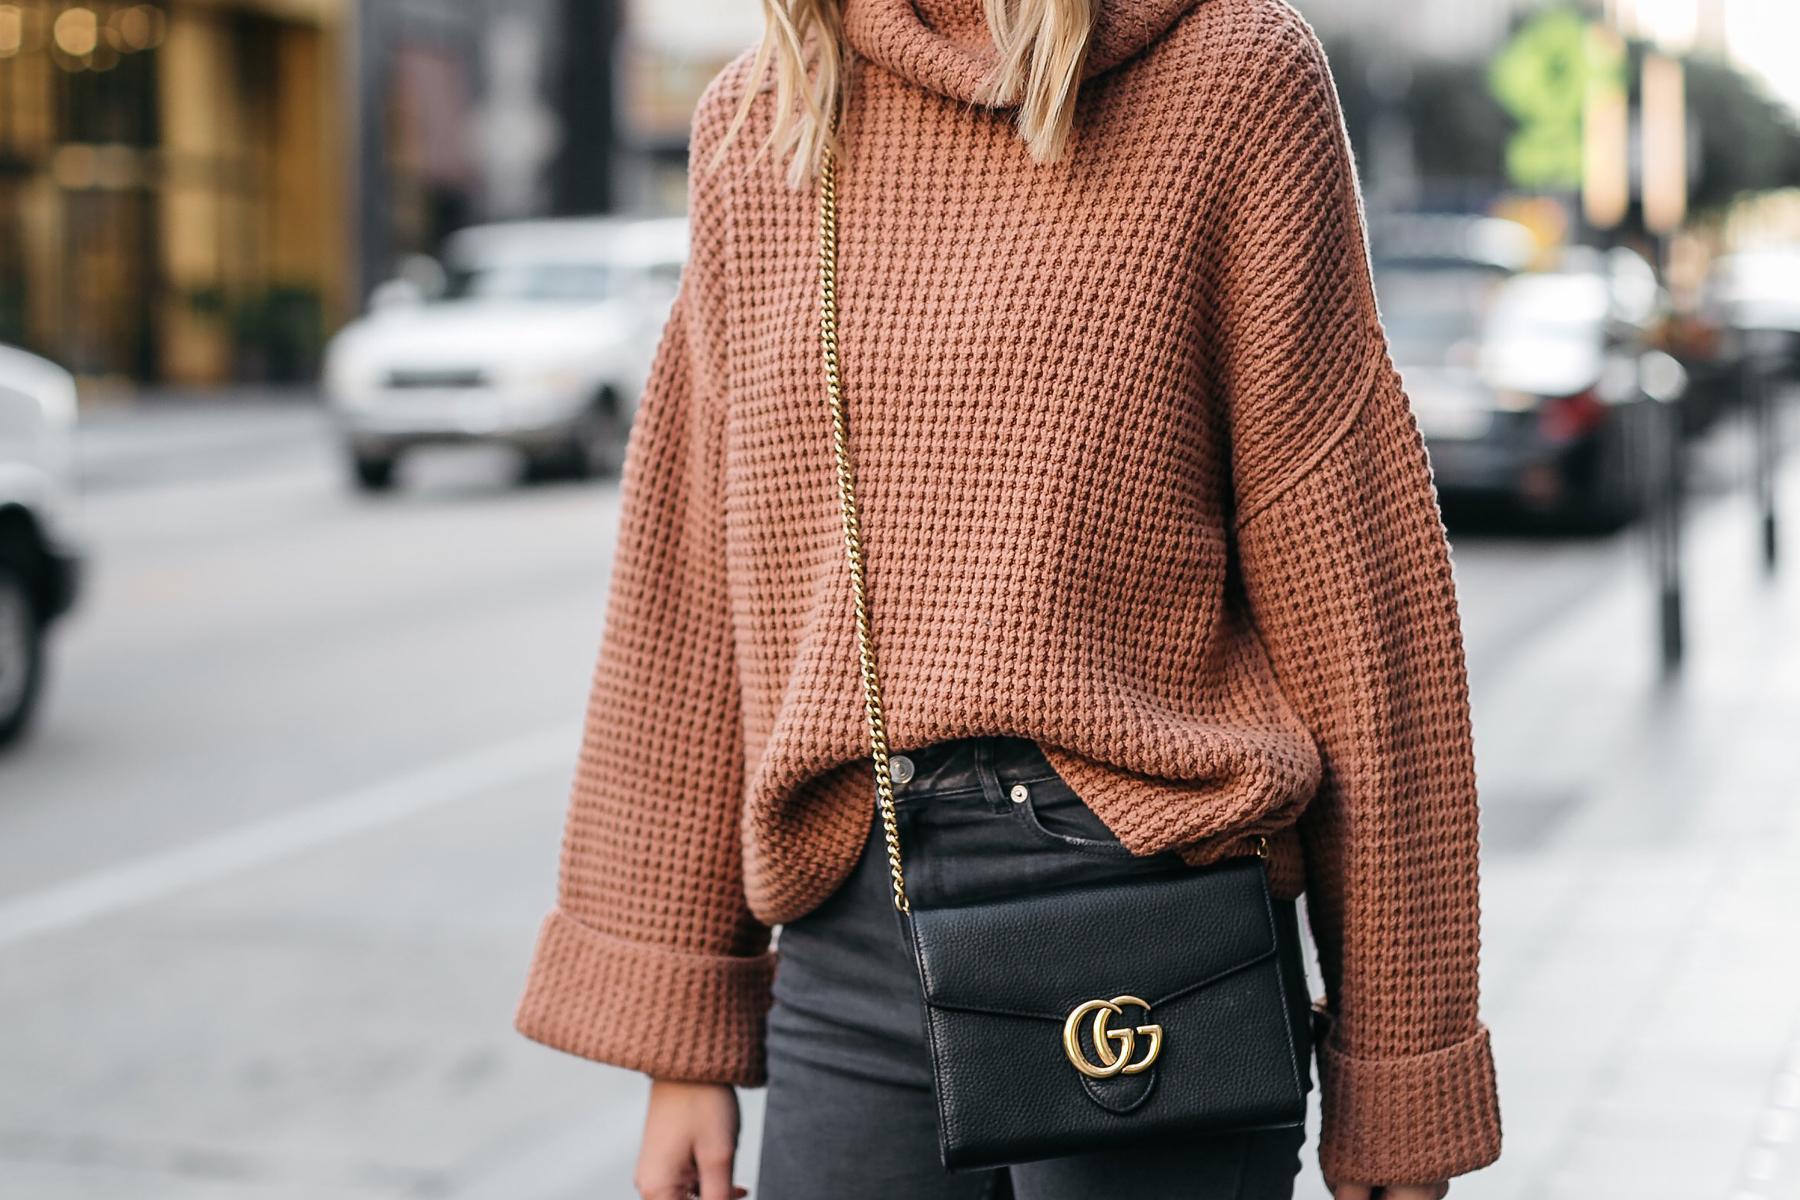 Jackson-Oversized-Sweater-Free-People-Park-City-Pullover-Tan-Sweater-Gucci-Marmont-Handbag